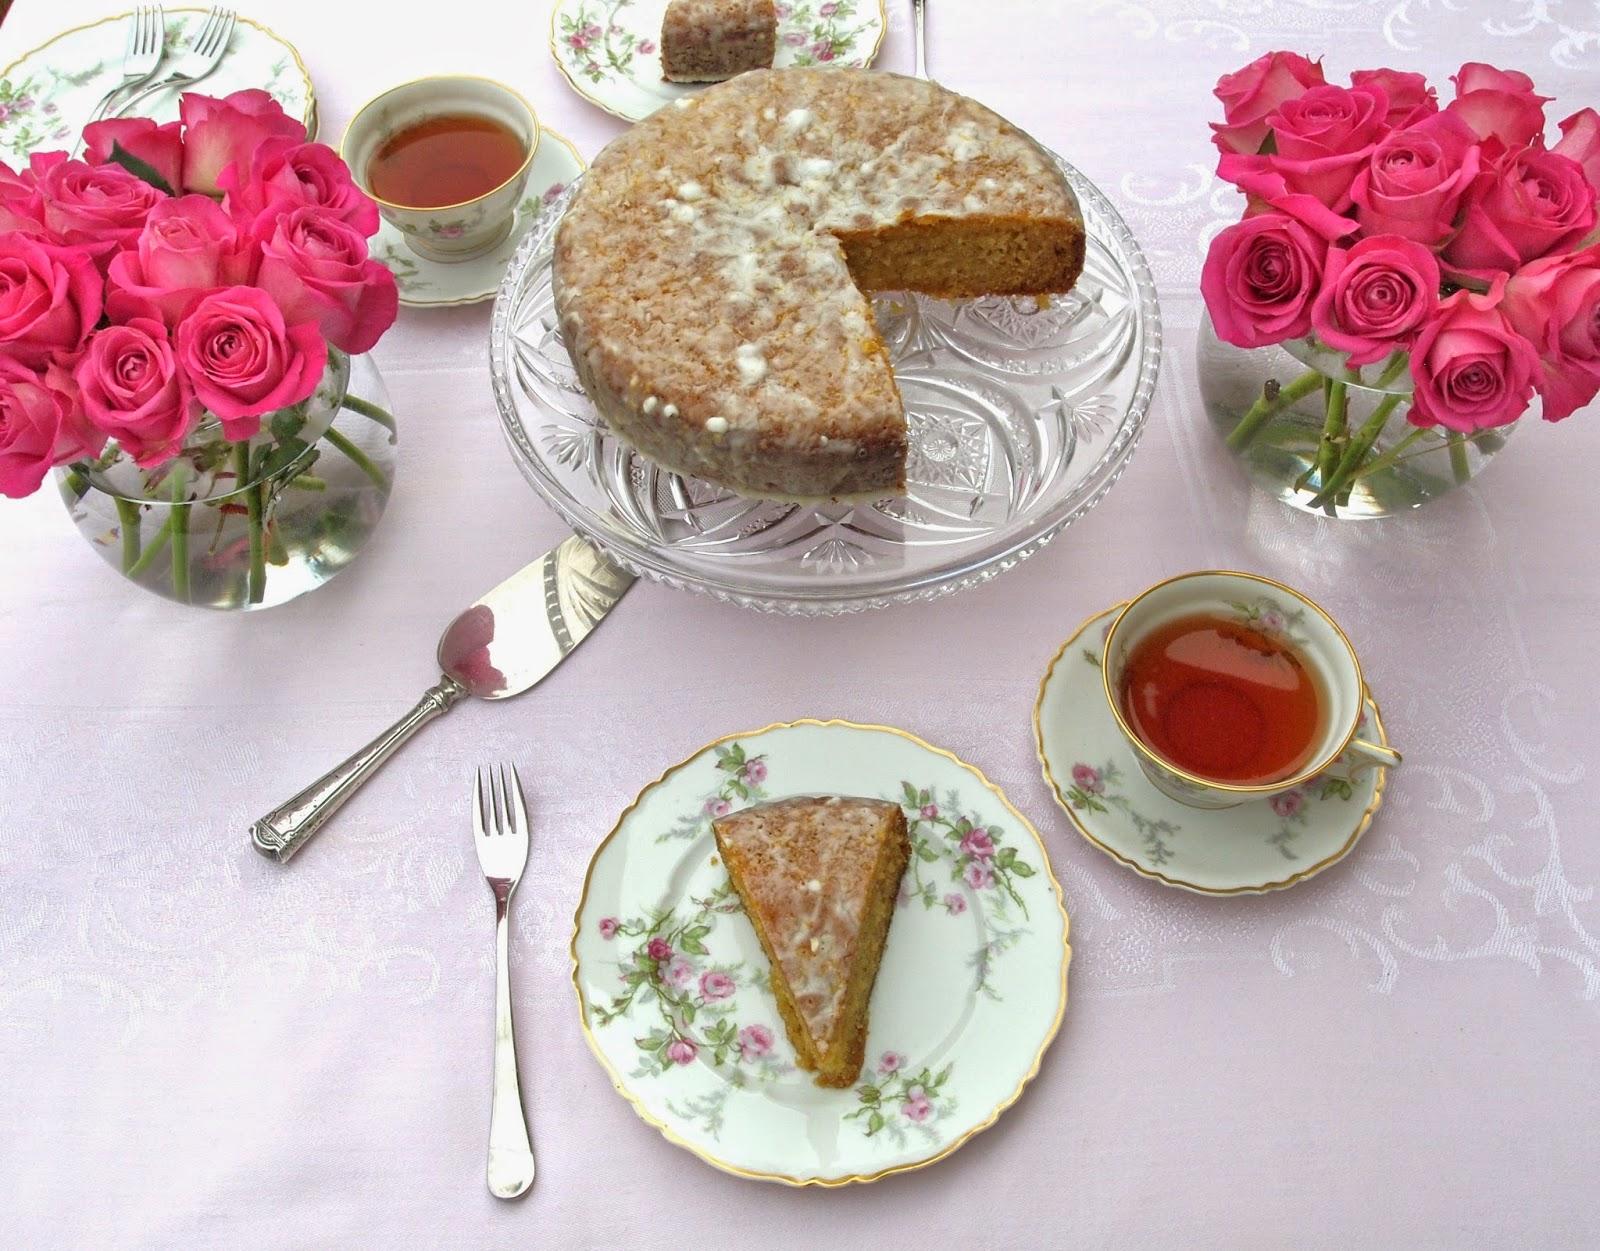 The Alchemist Lemon Cornmeal Cake